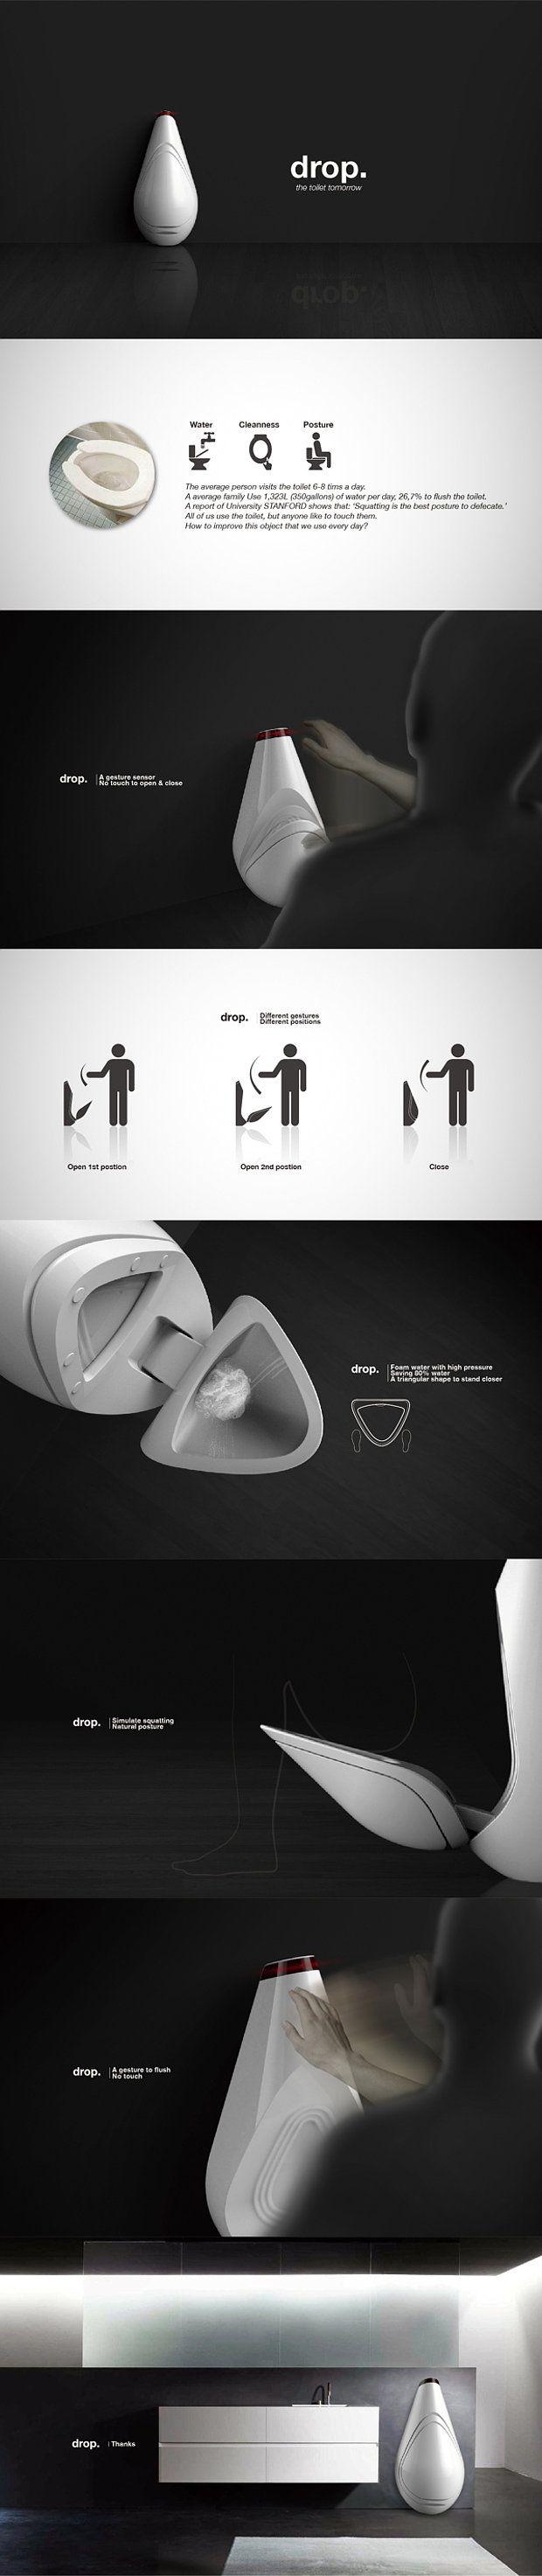 Drop - the toilet of tomorrow by Pengfei LI